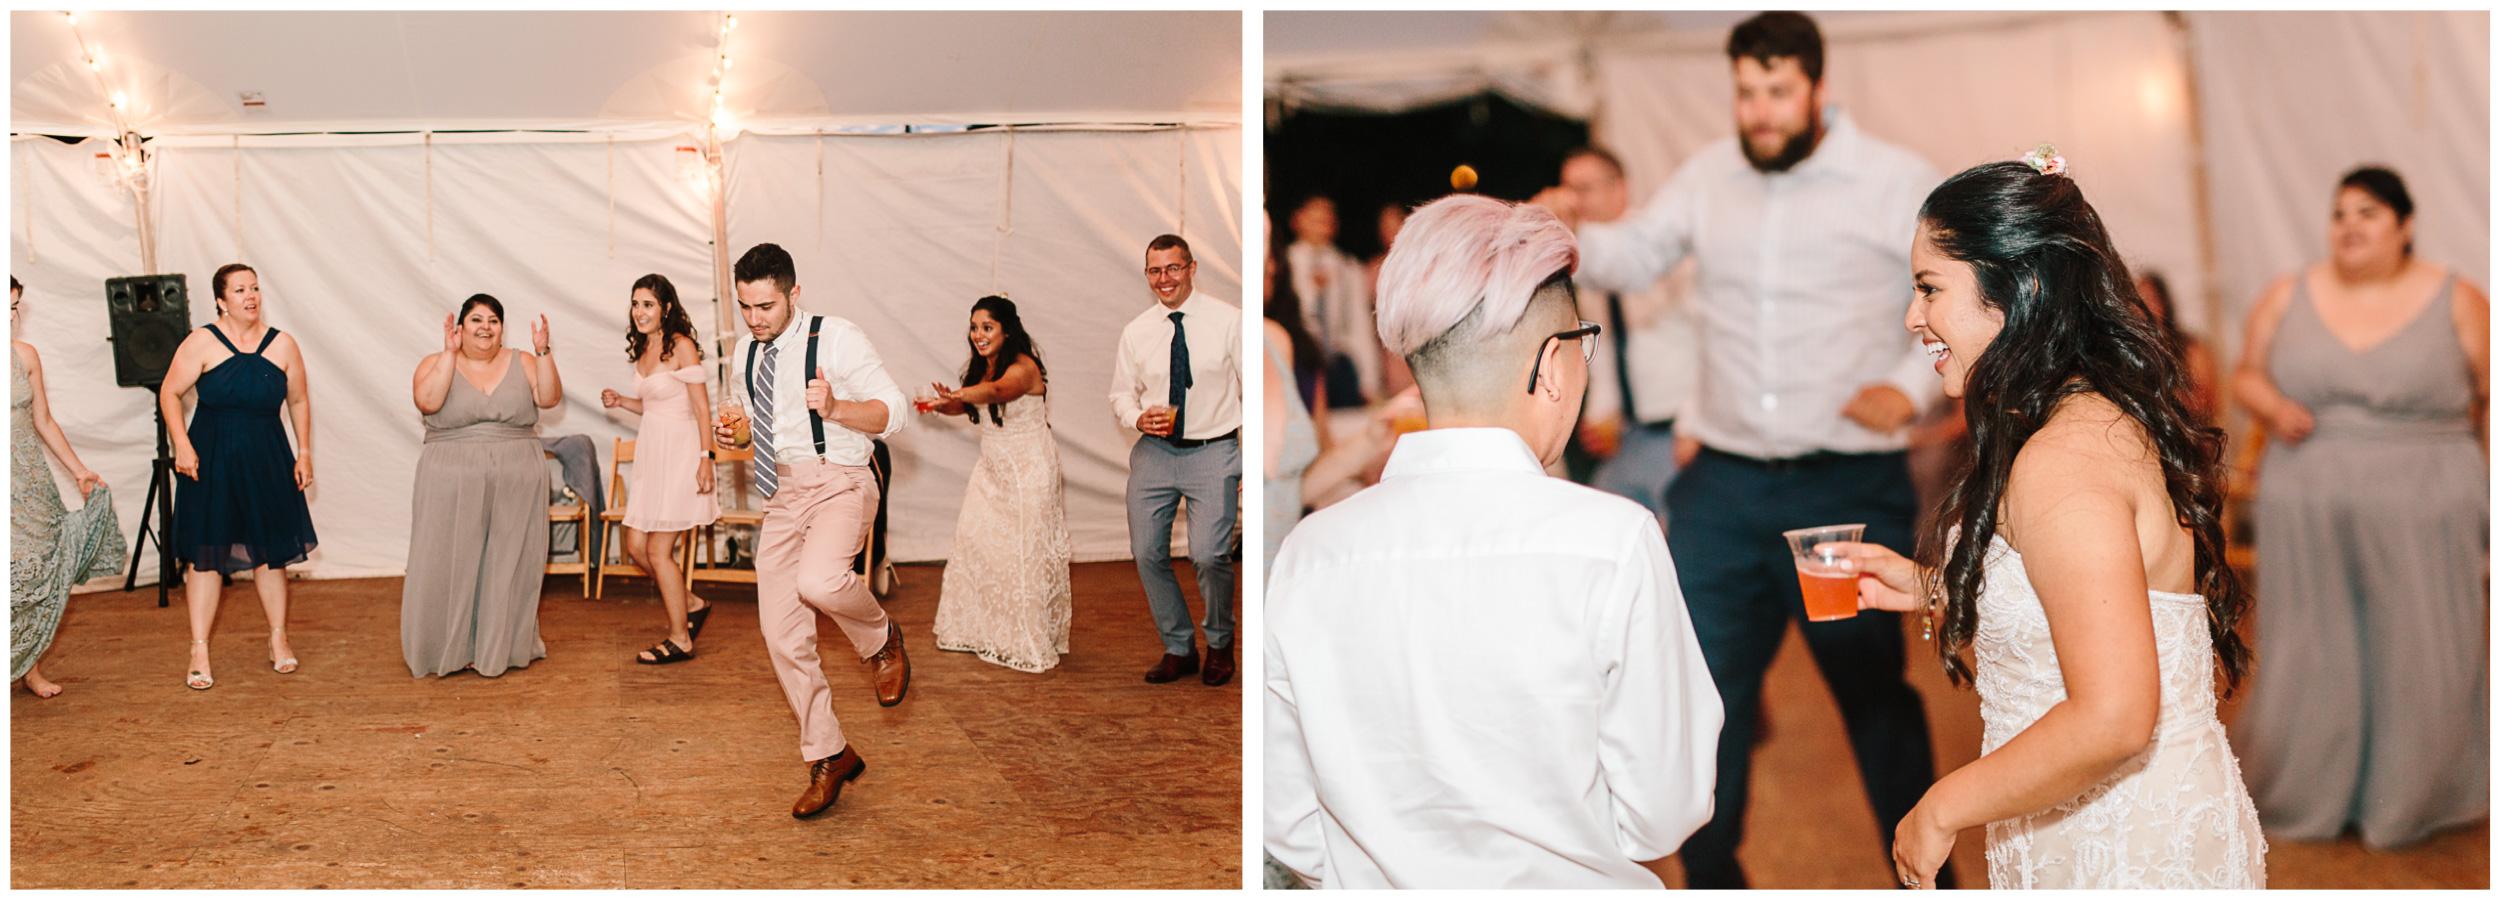 lyons_farmette_wedding_96.jpg